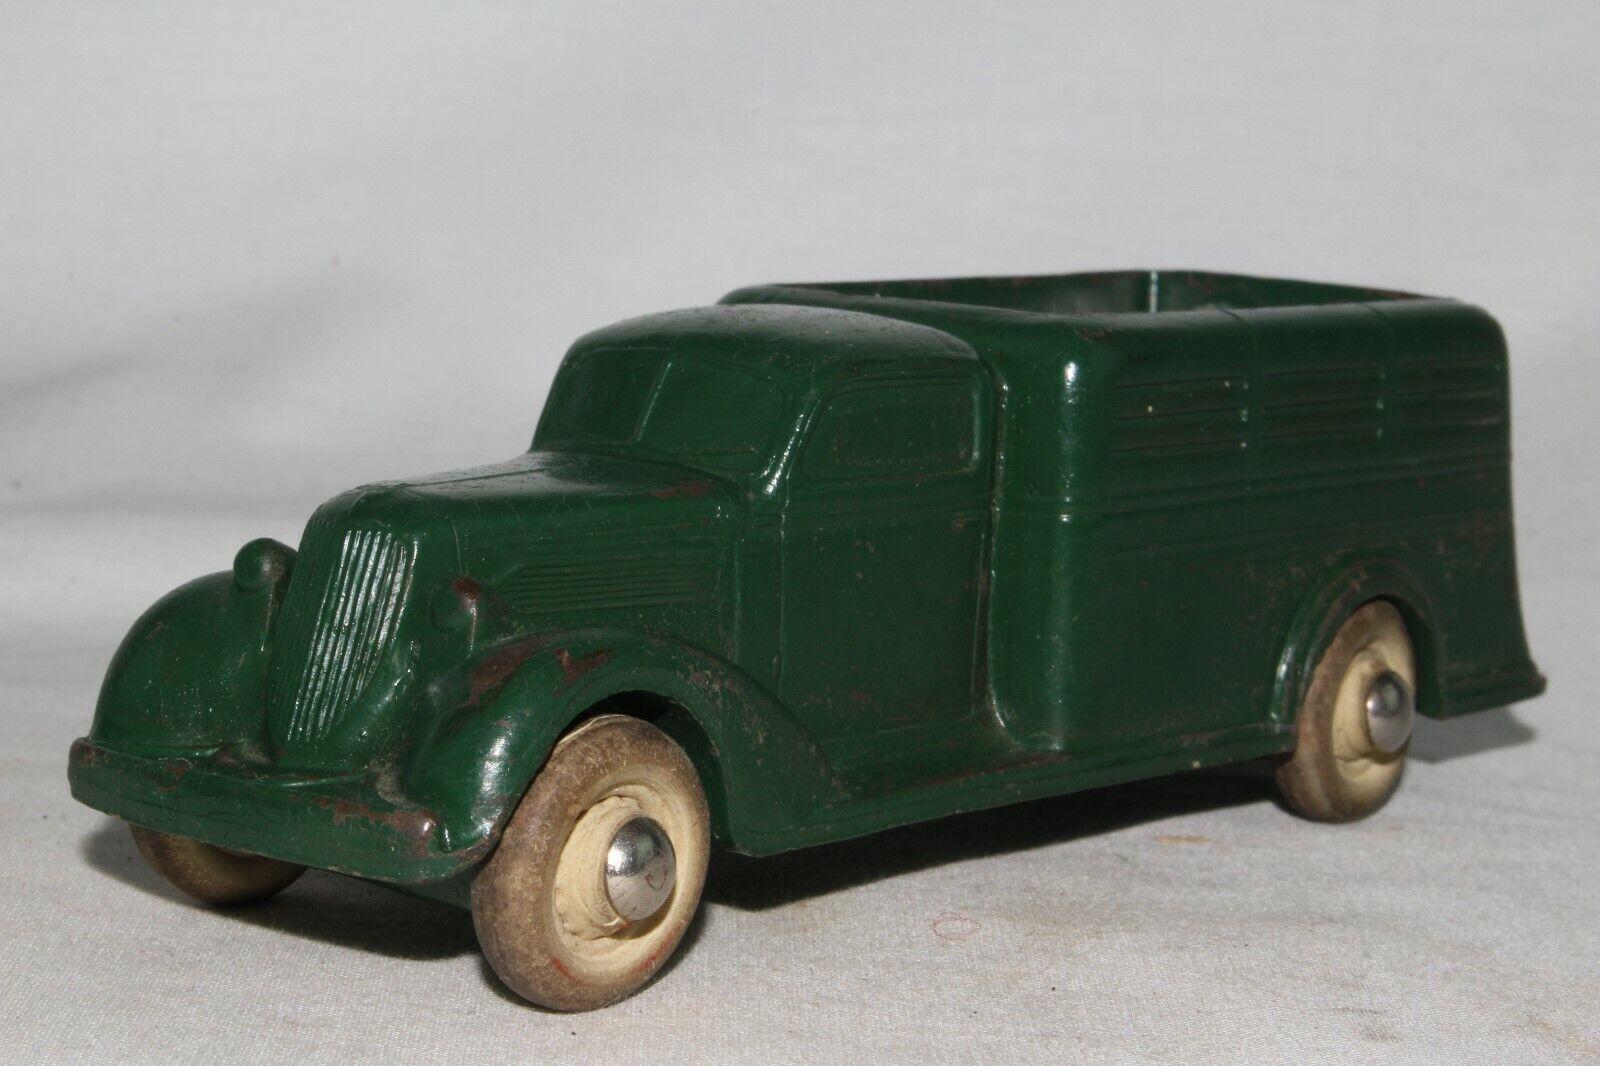 Rainbow Rubber 1935 Studebaker Stake Truck, Grün, Original